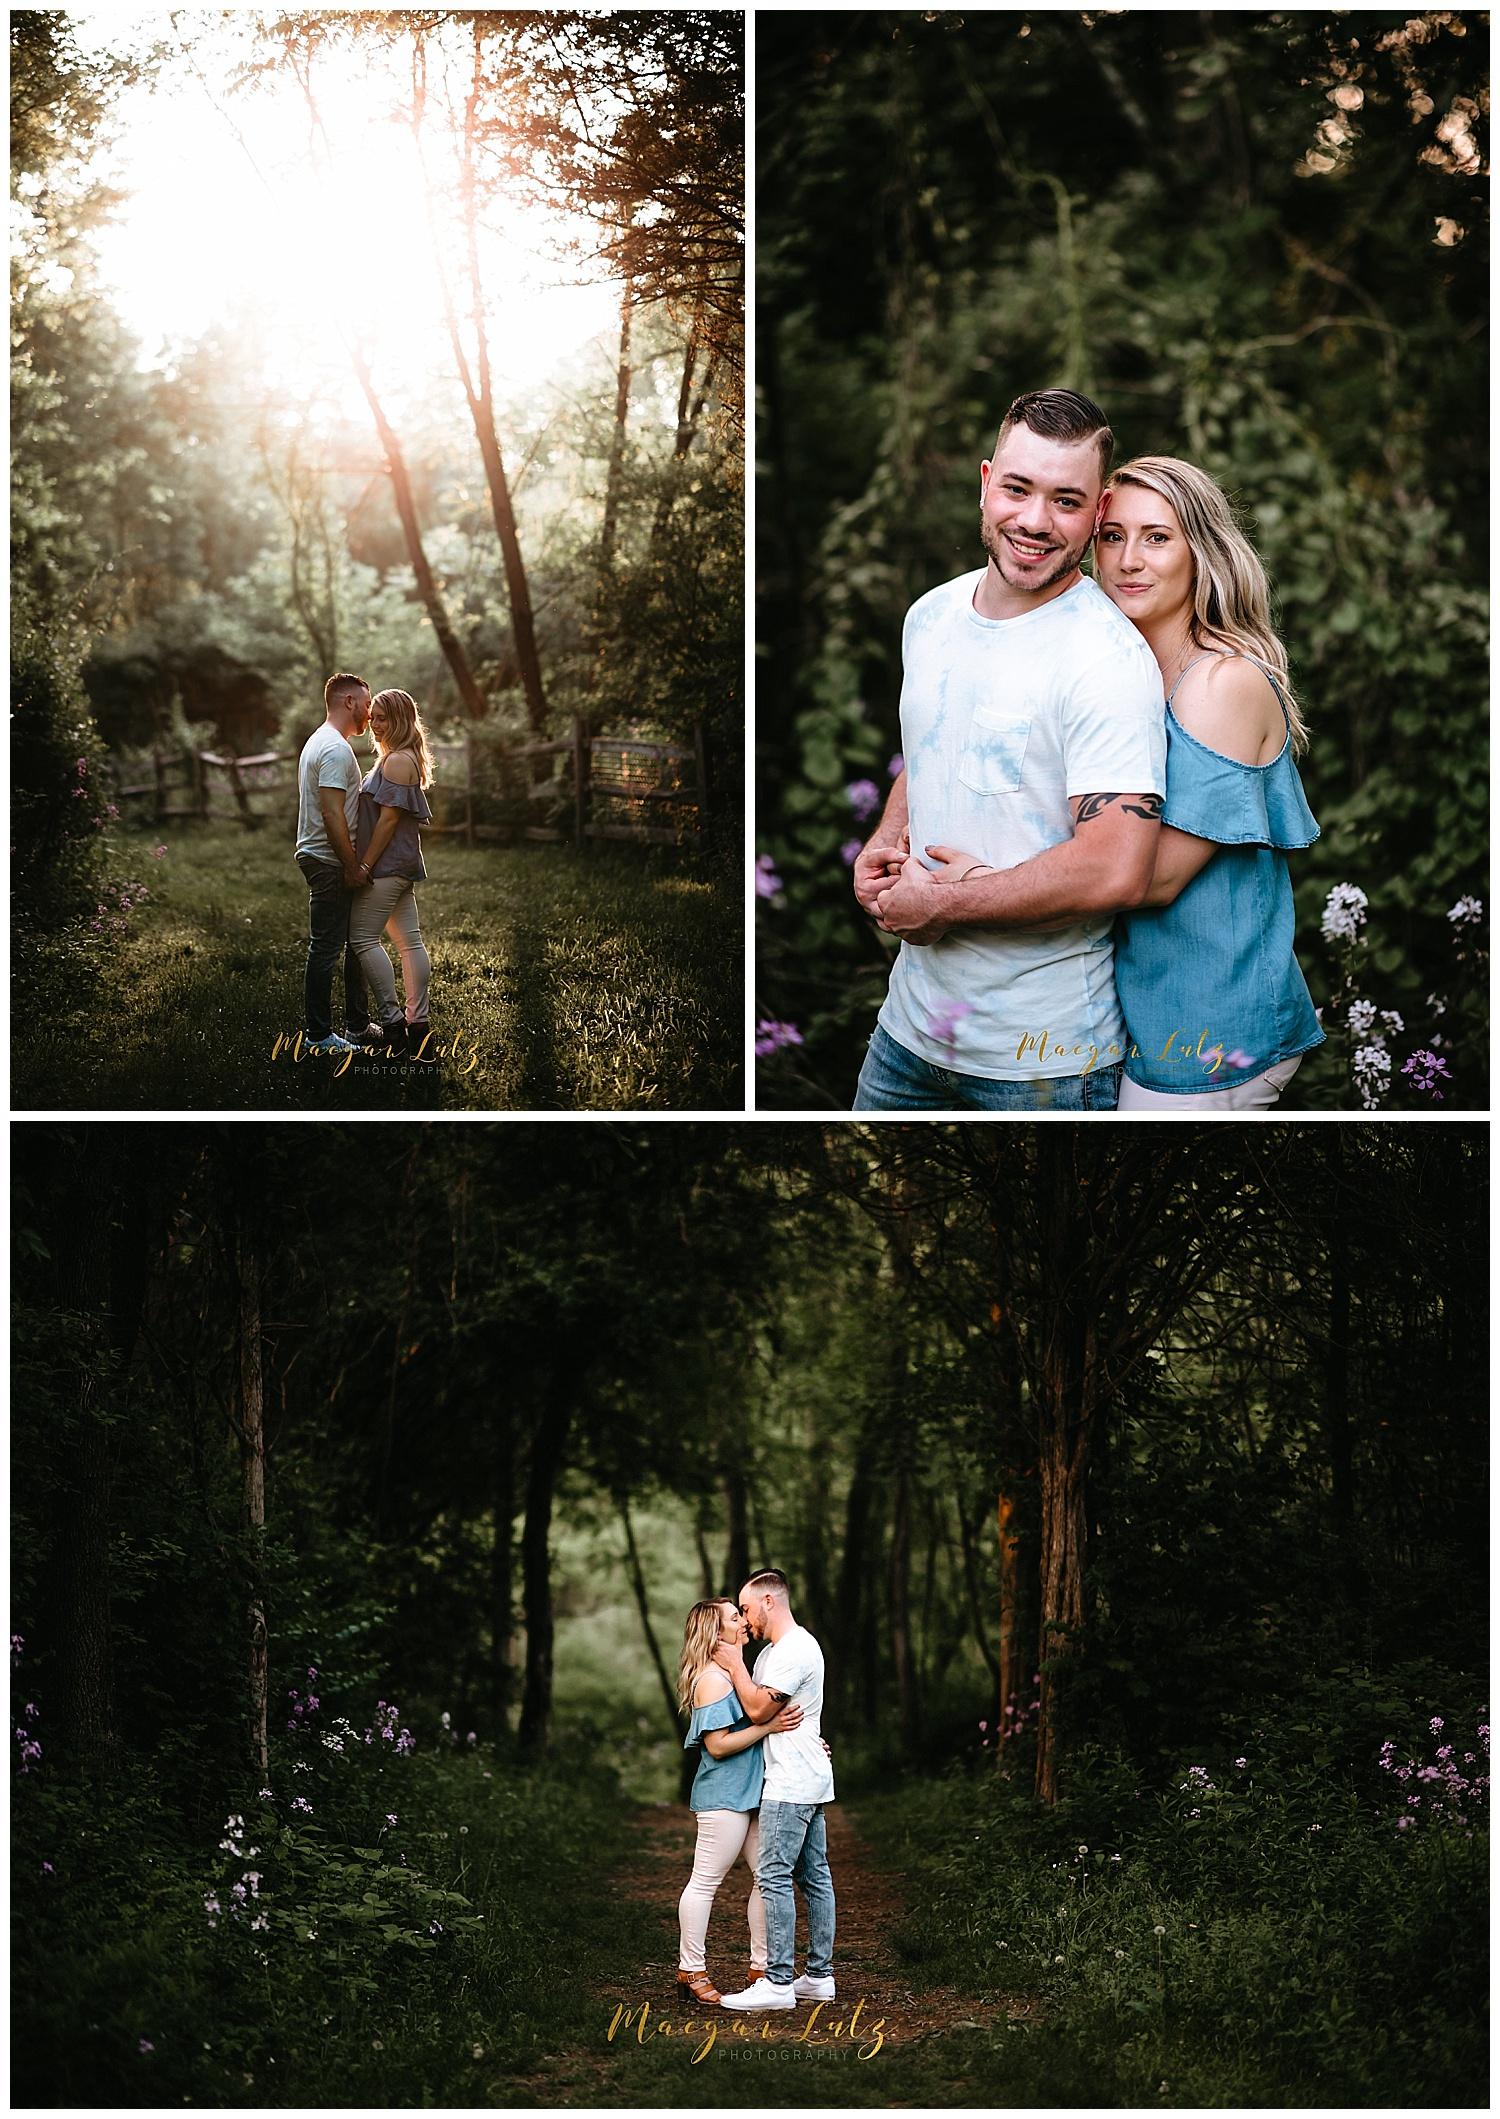 NEPA-wedding-engagement-photographer-Jacobsburg-state-park-Easton-PA_0047.jpg